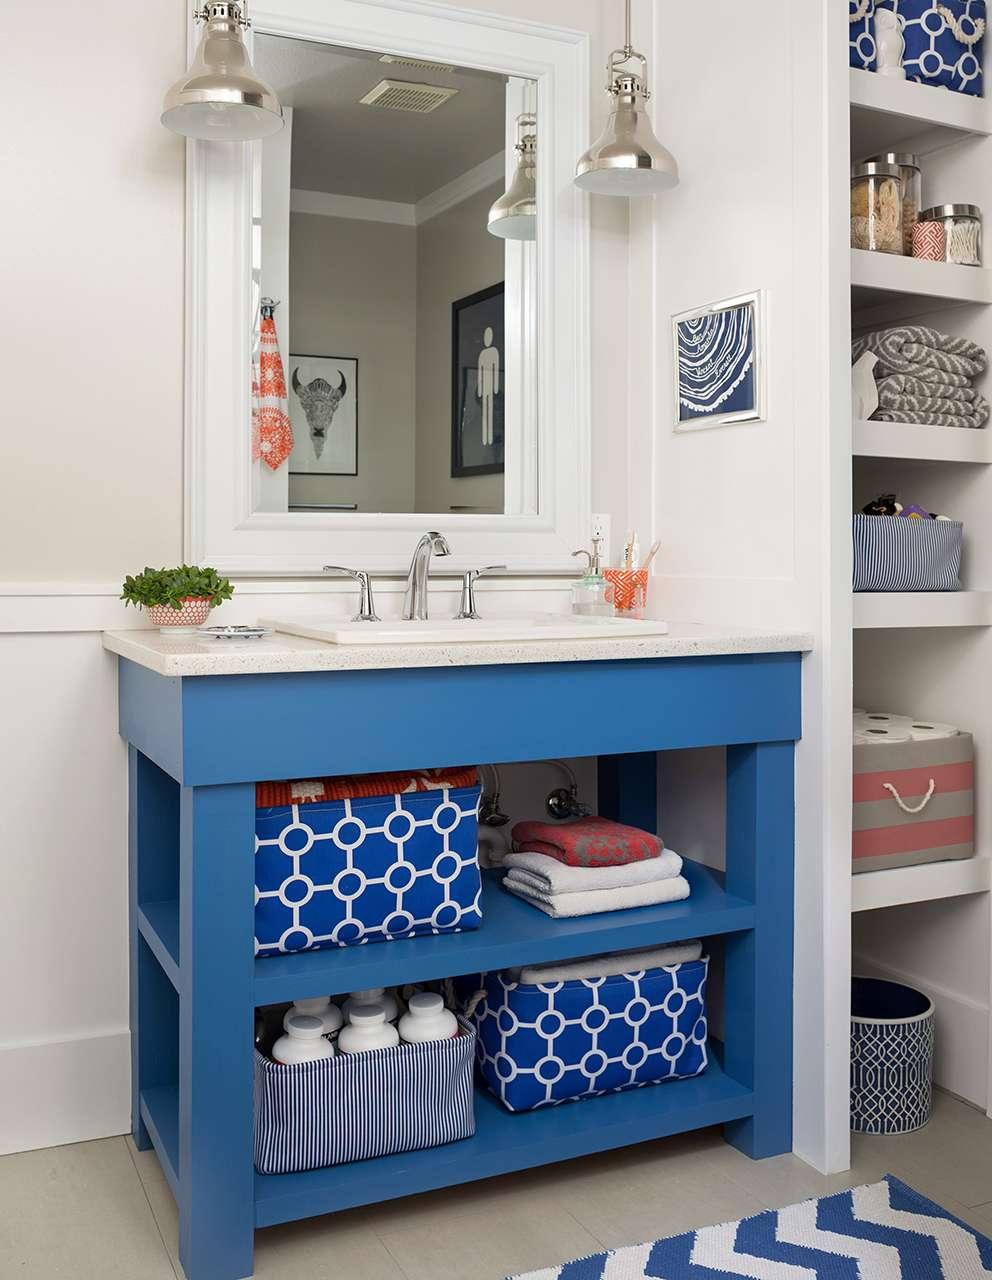 Diy Bathroom Vanity Ideas Better Homes Gardens